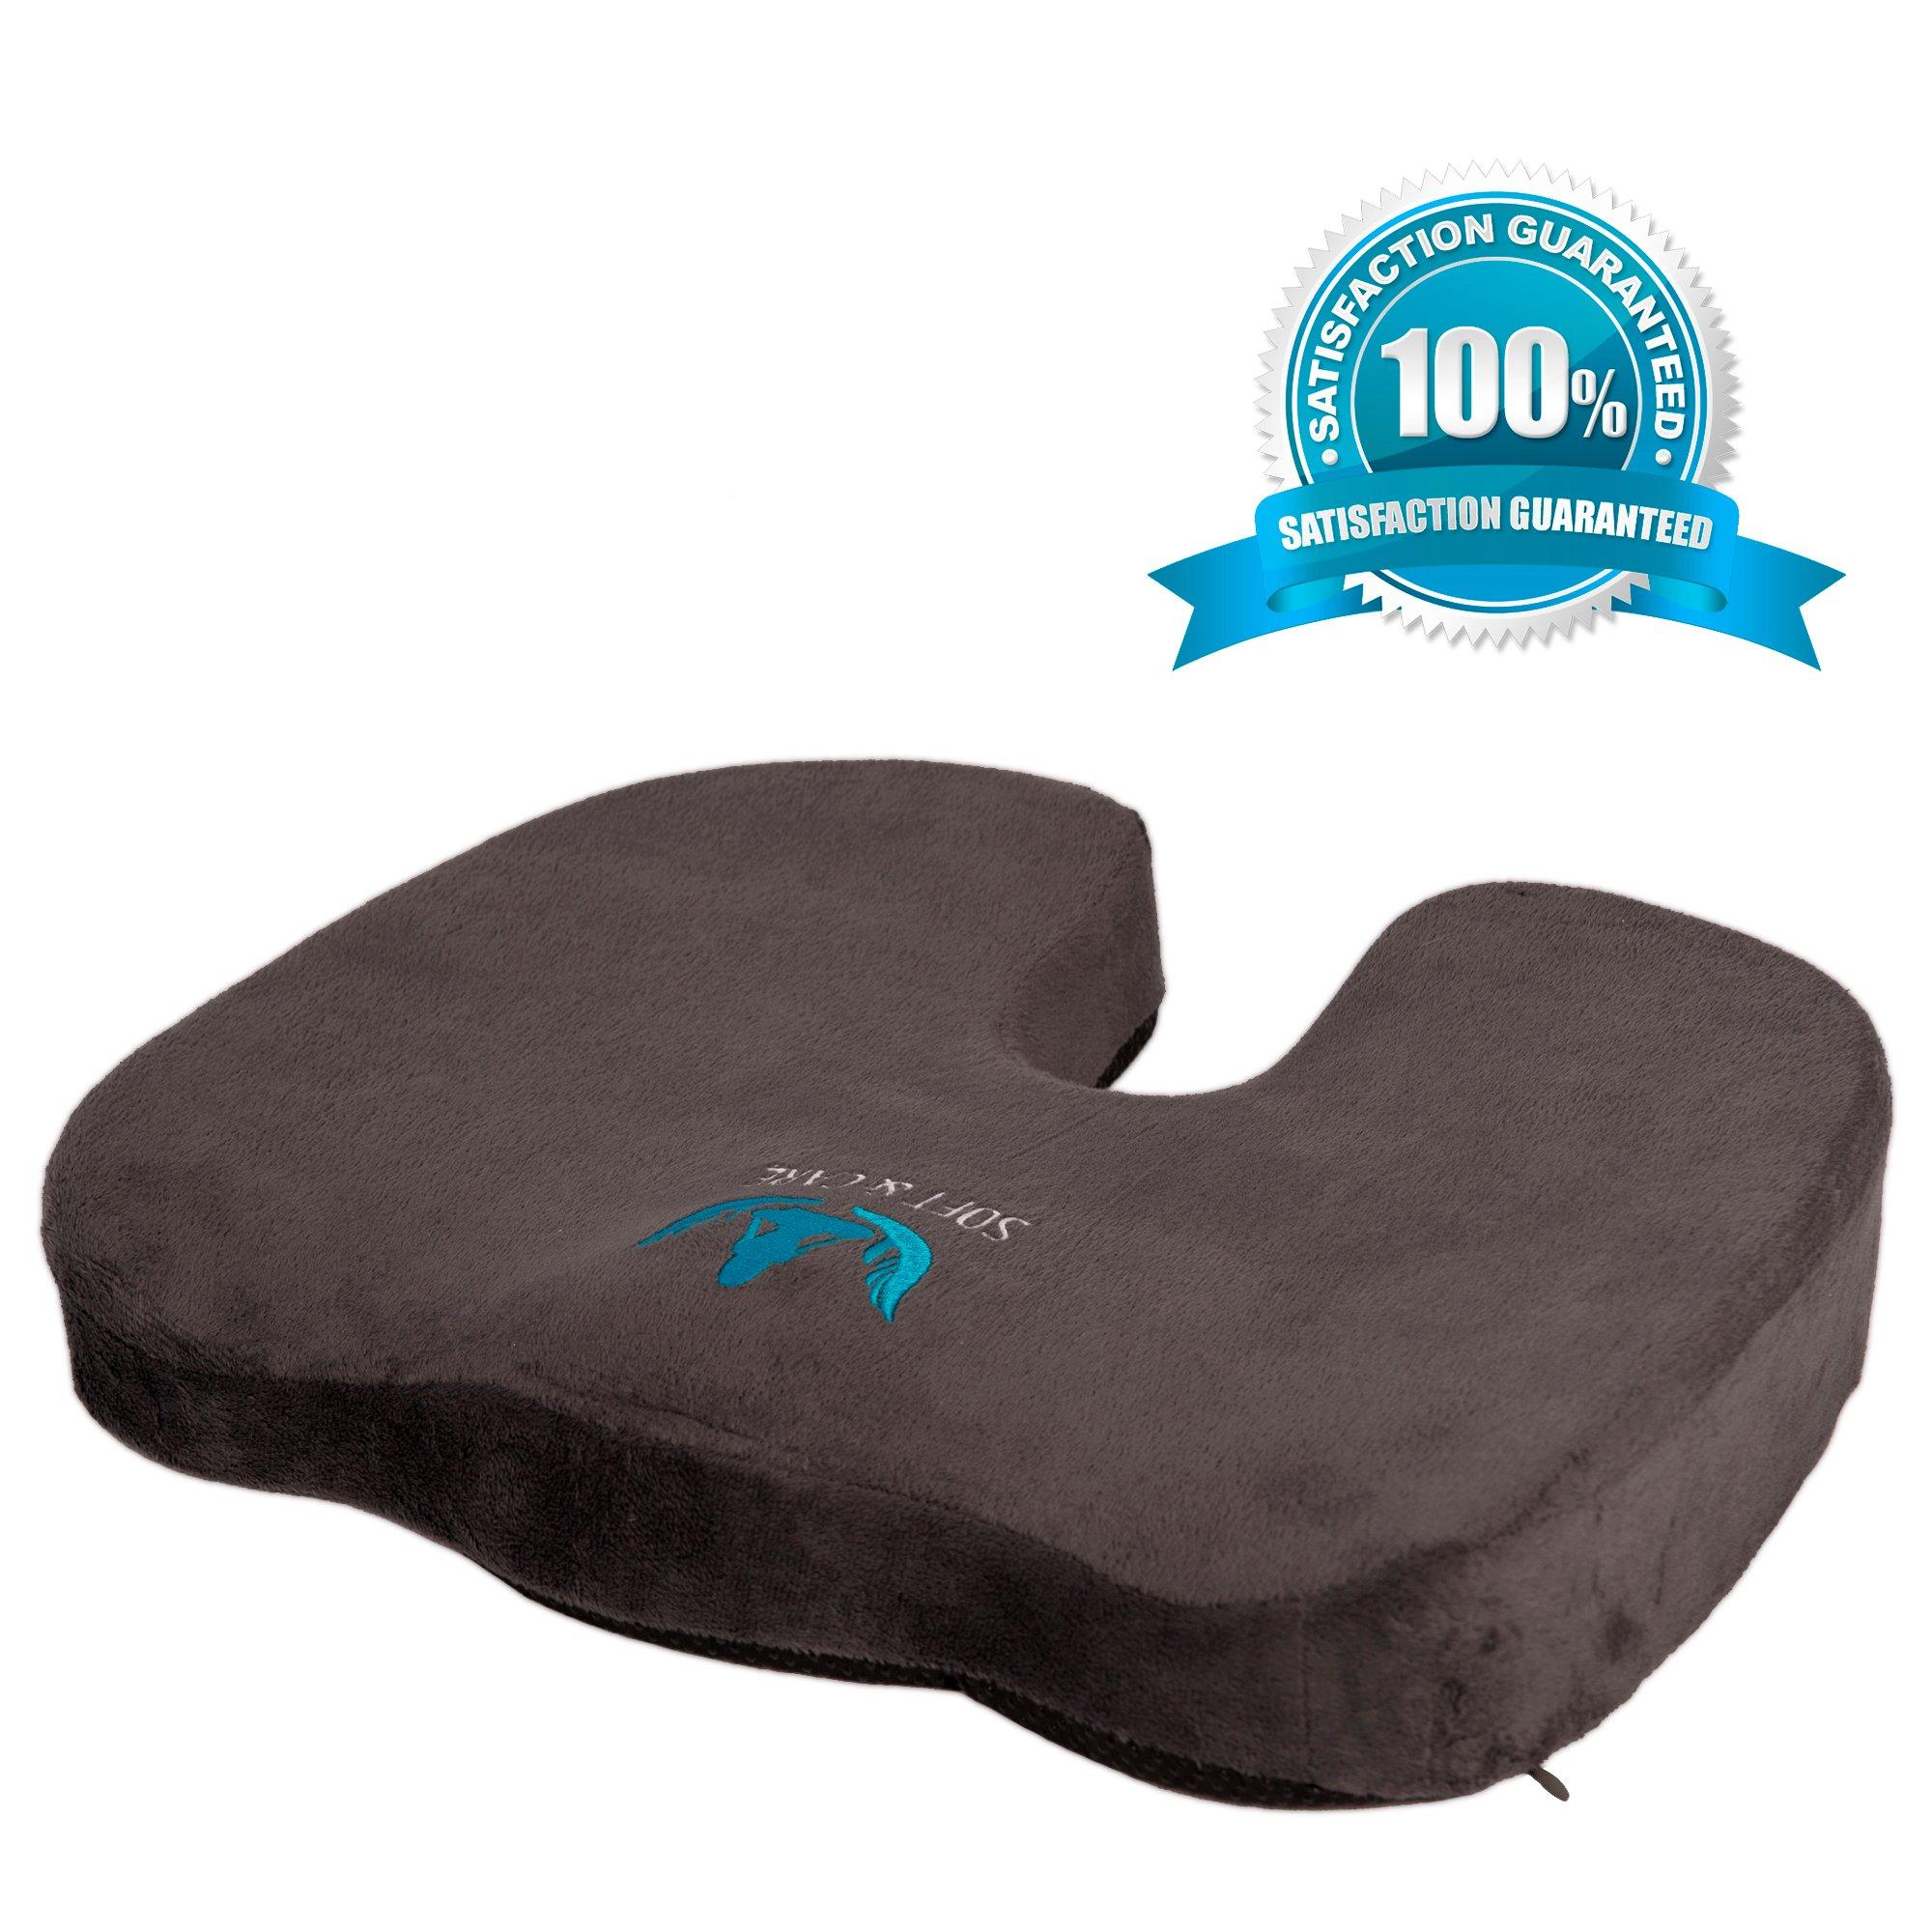 premium orthopedic seat cushion